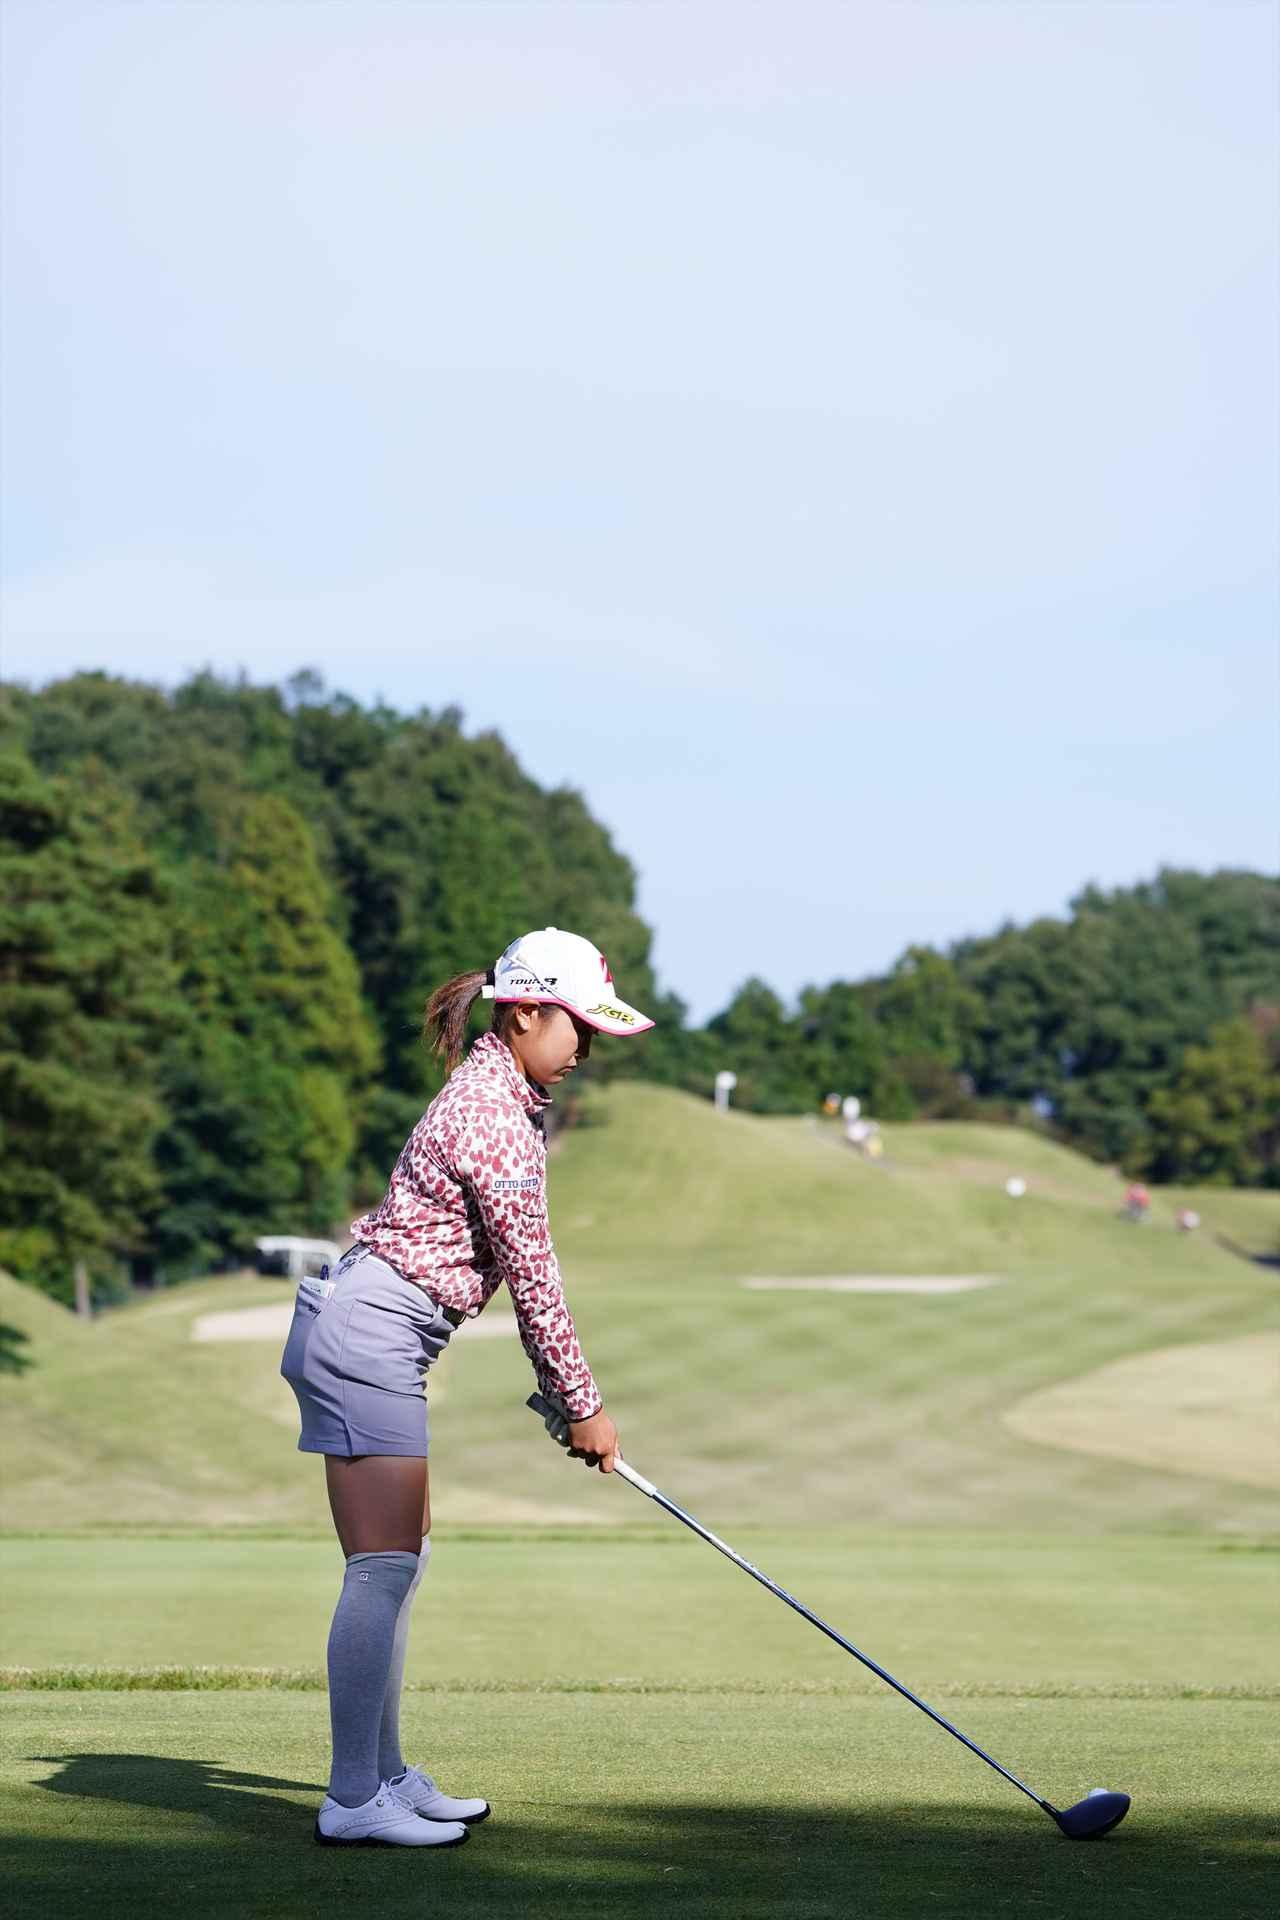 Images : 1番目の画像 - 高木優奈 ドライバー後方連続写真 - みんなのゴルフダイジェスト